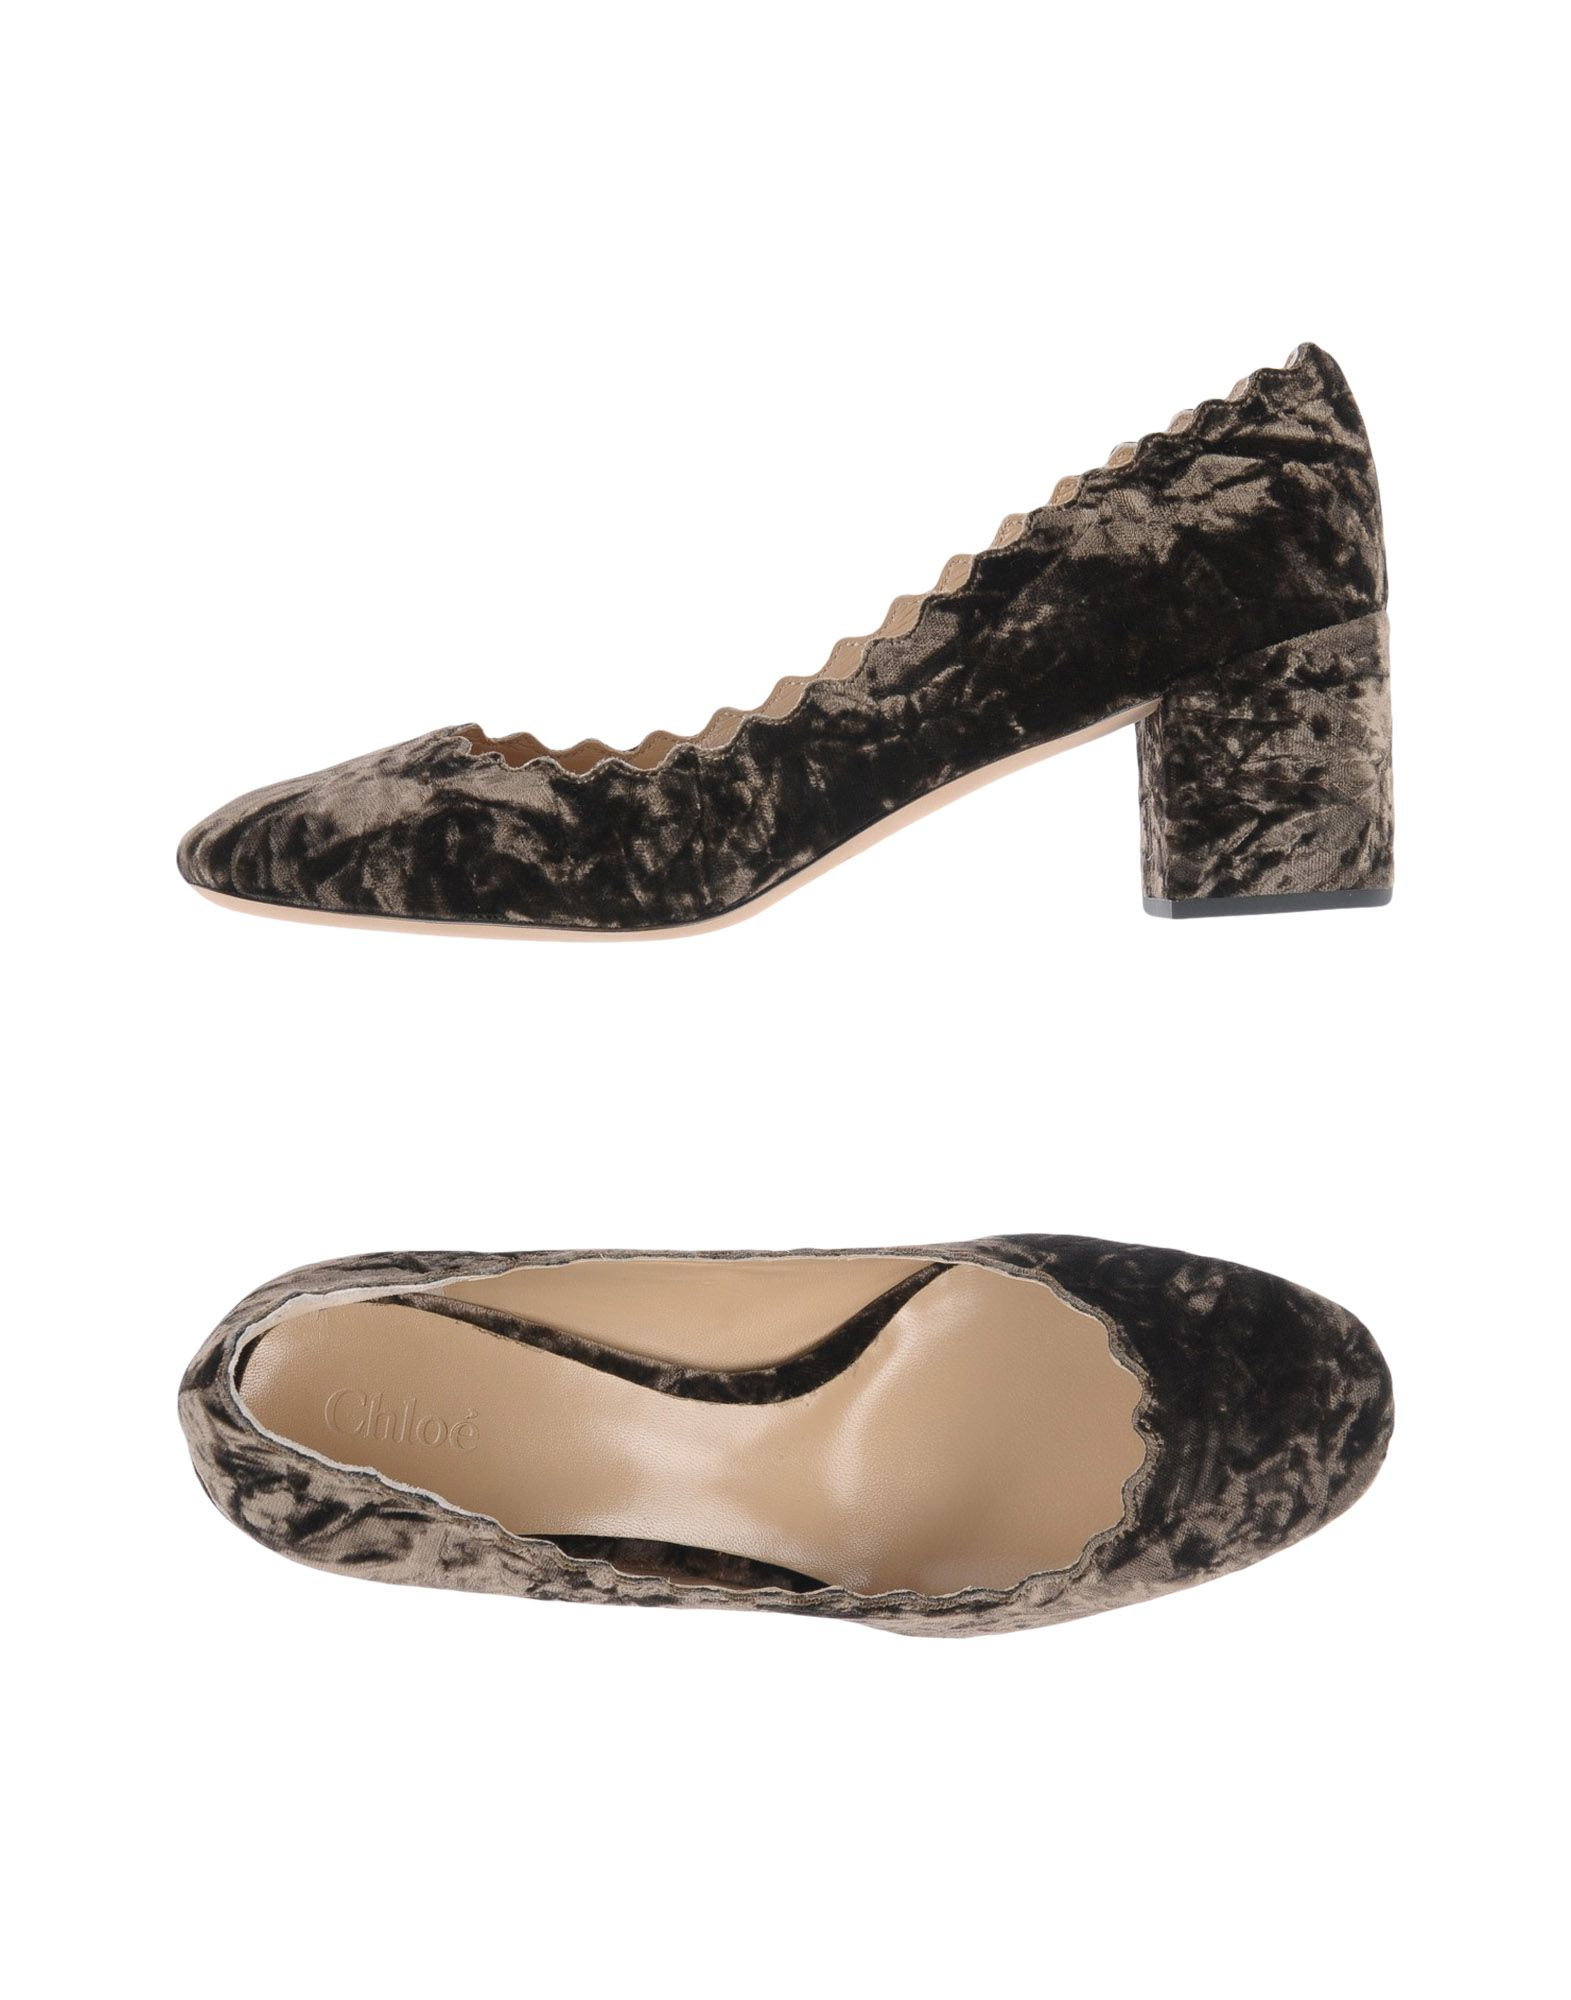 Rabatt Schuhe 11489198QG Chloé Pumps Damen  11489198QG Schuhe 126eb3